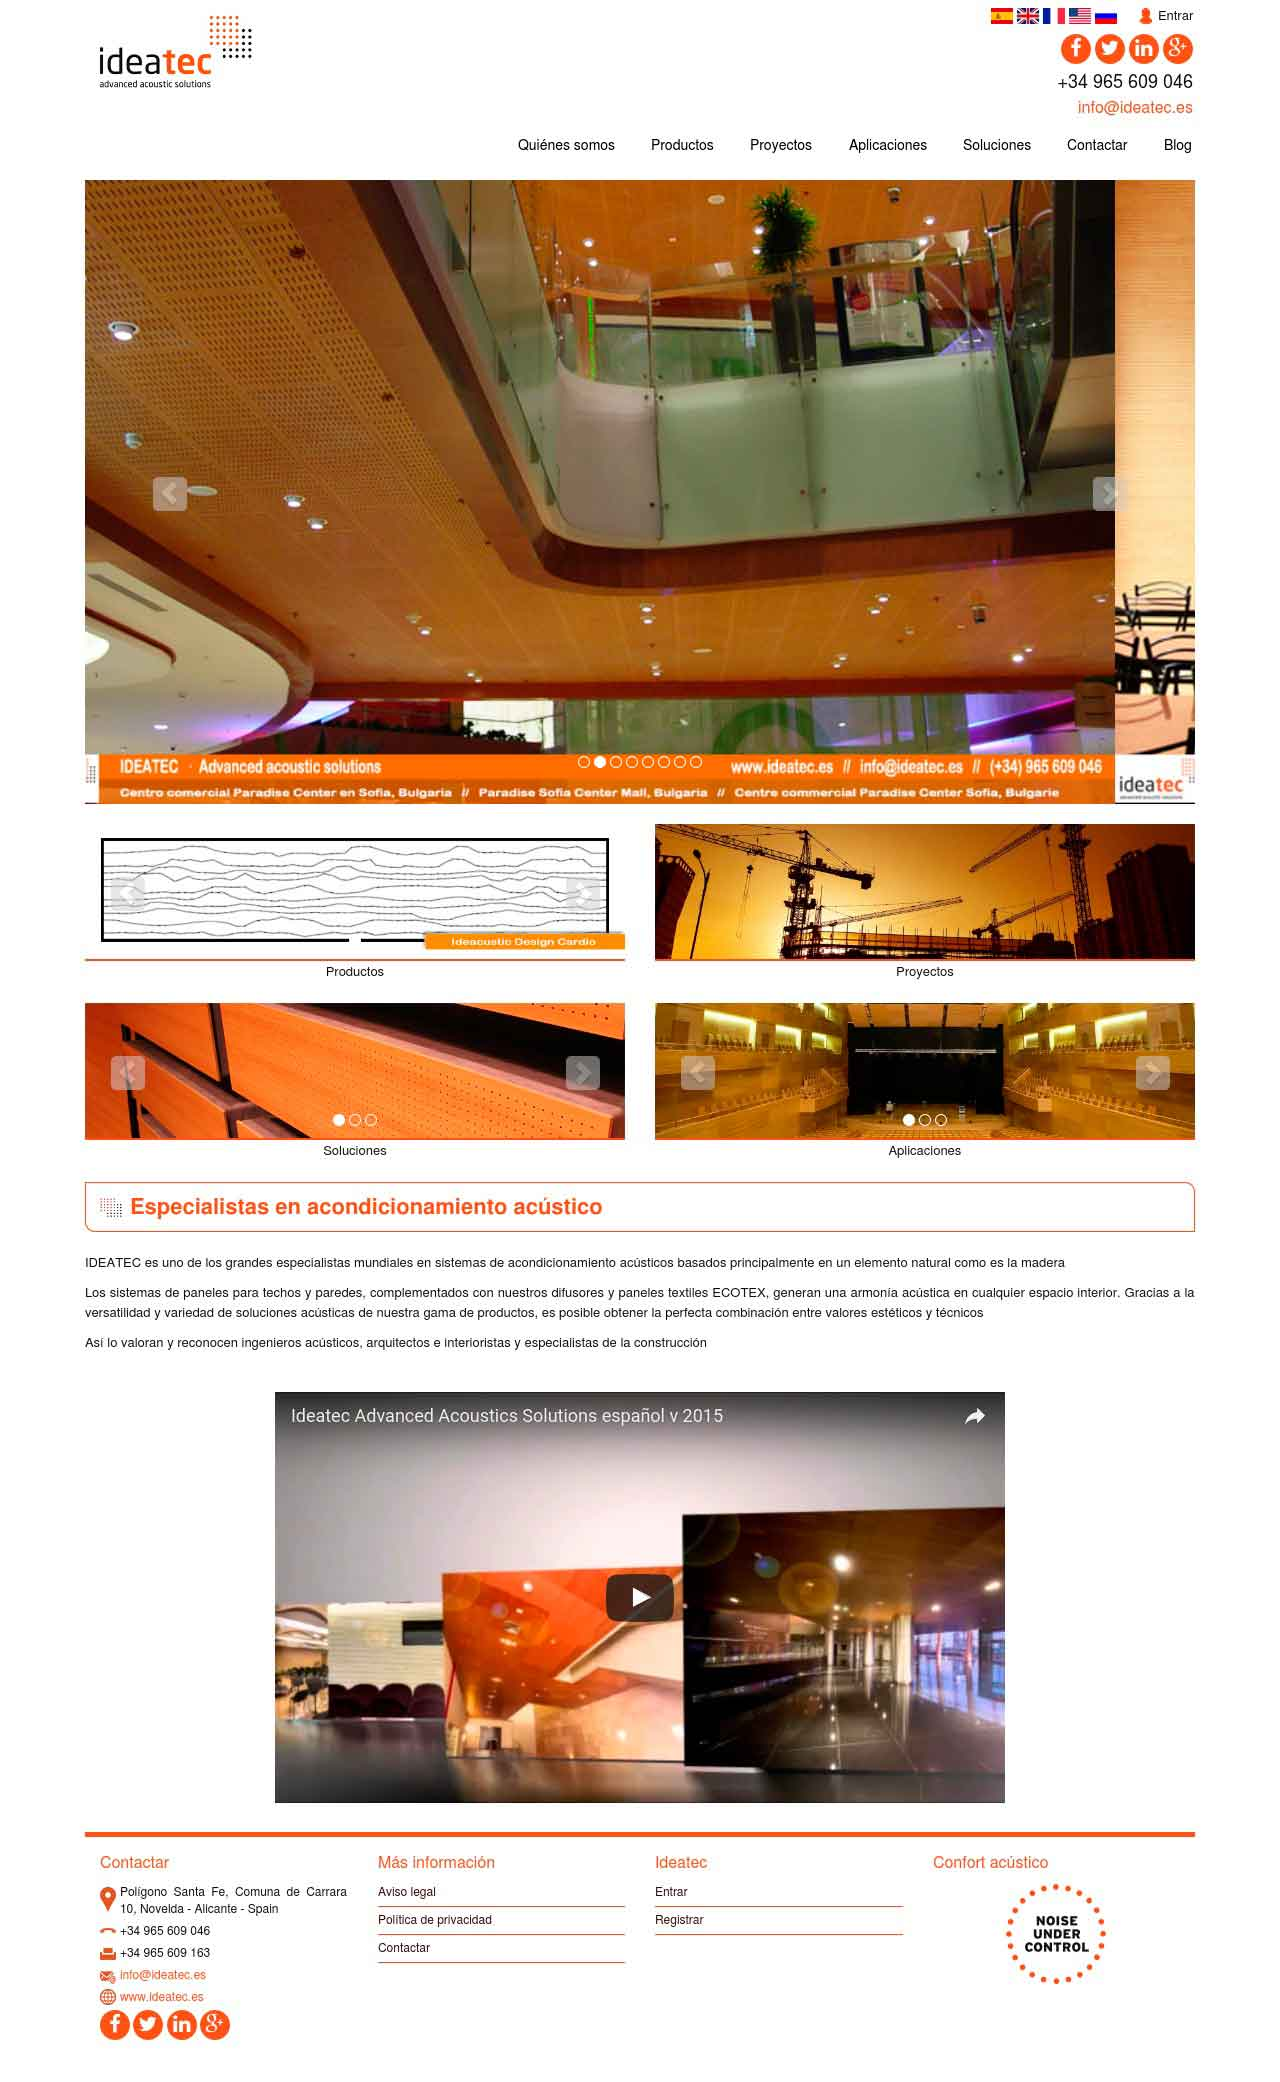 Agencia Sidecar ideatec-inicio-agencia-sidecar Ideatec